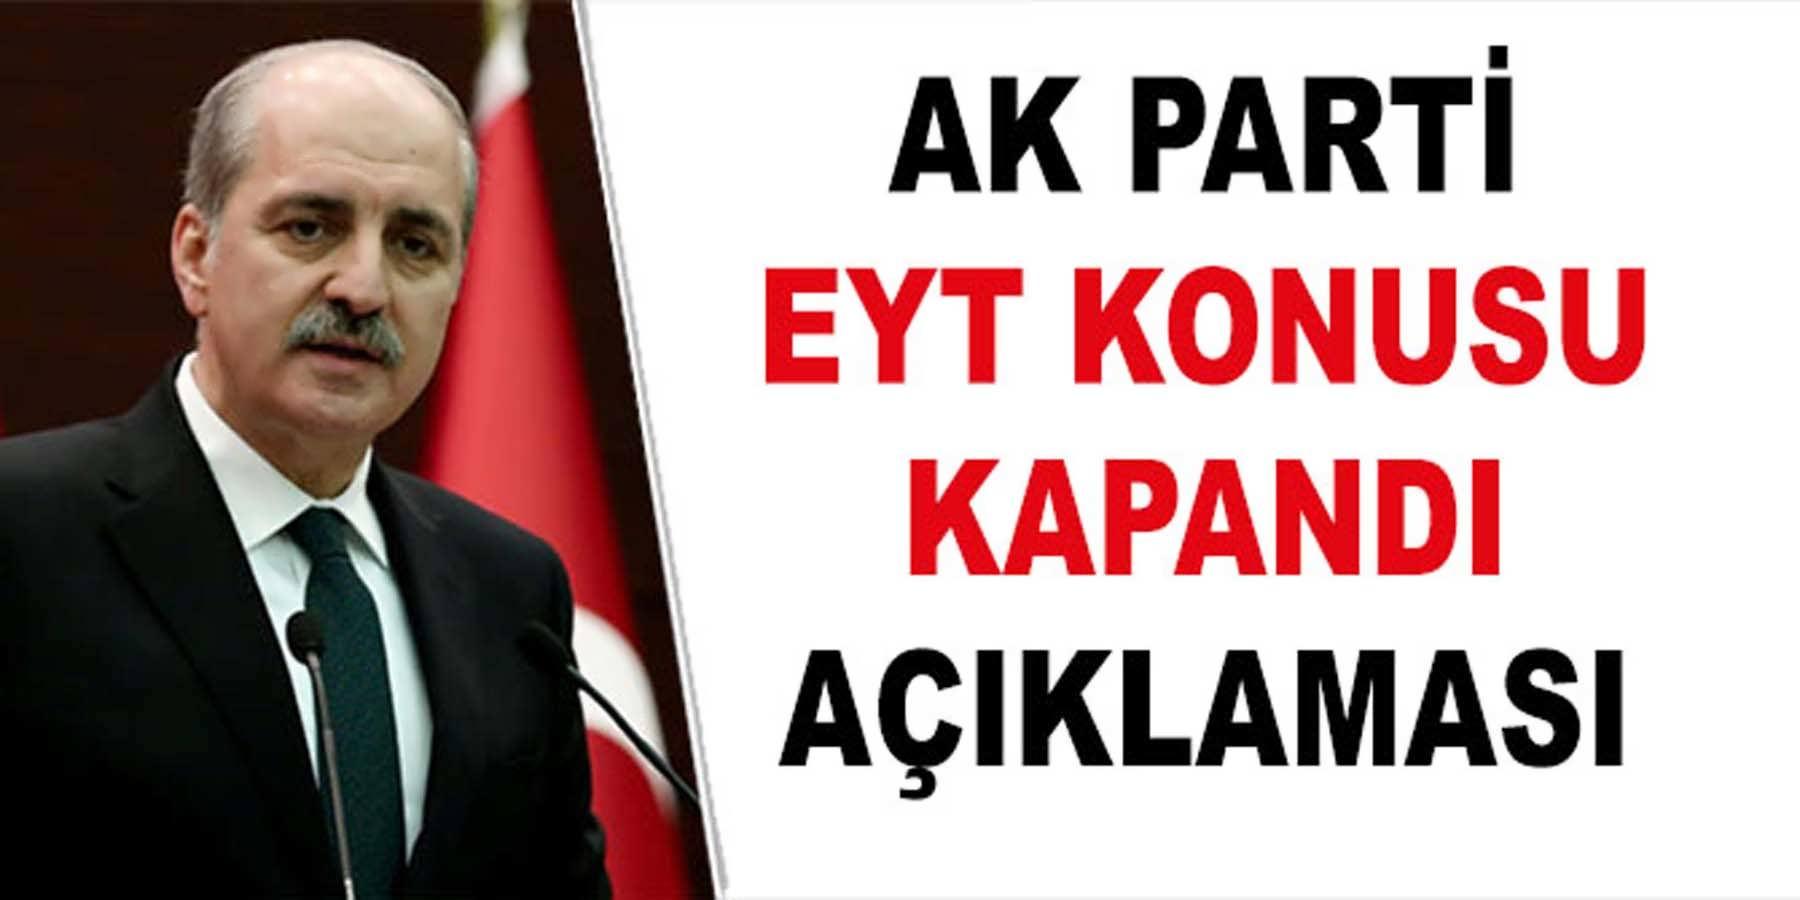 AK Parti EYT Konusu Kapandı